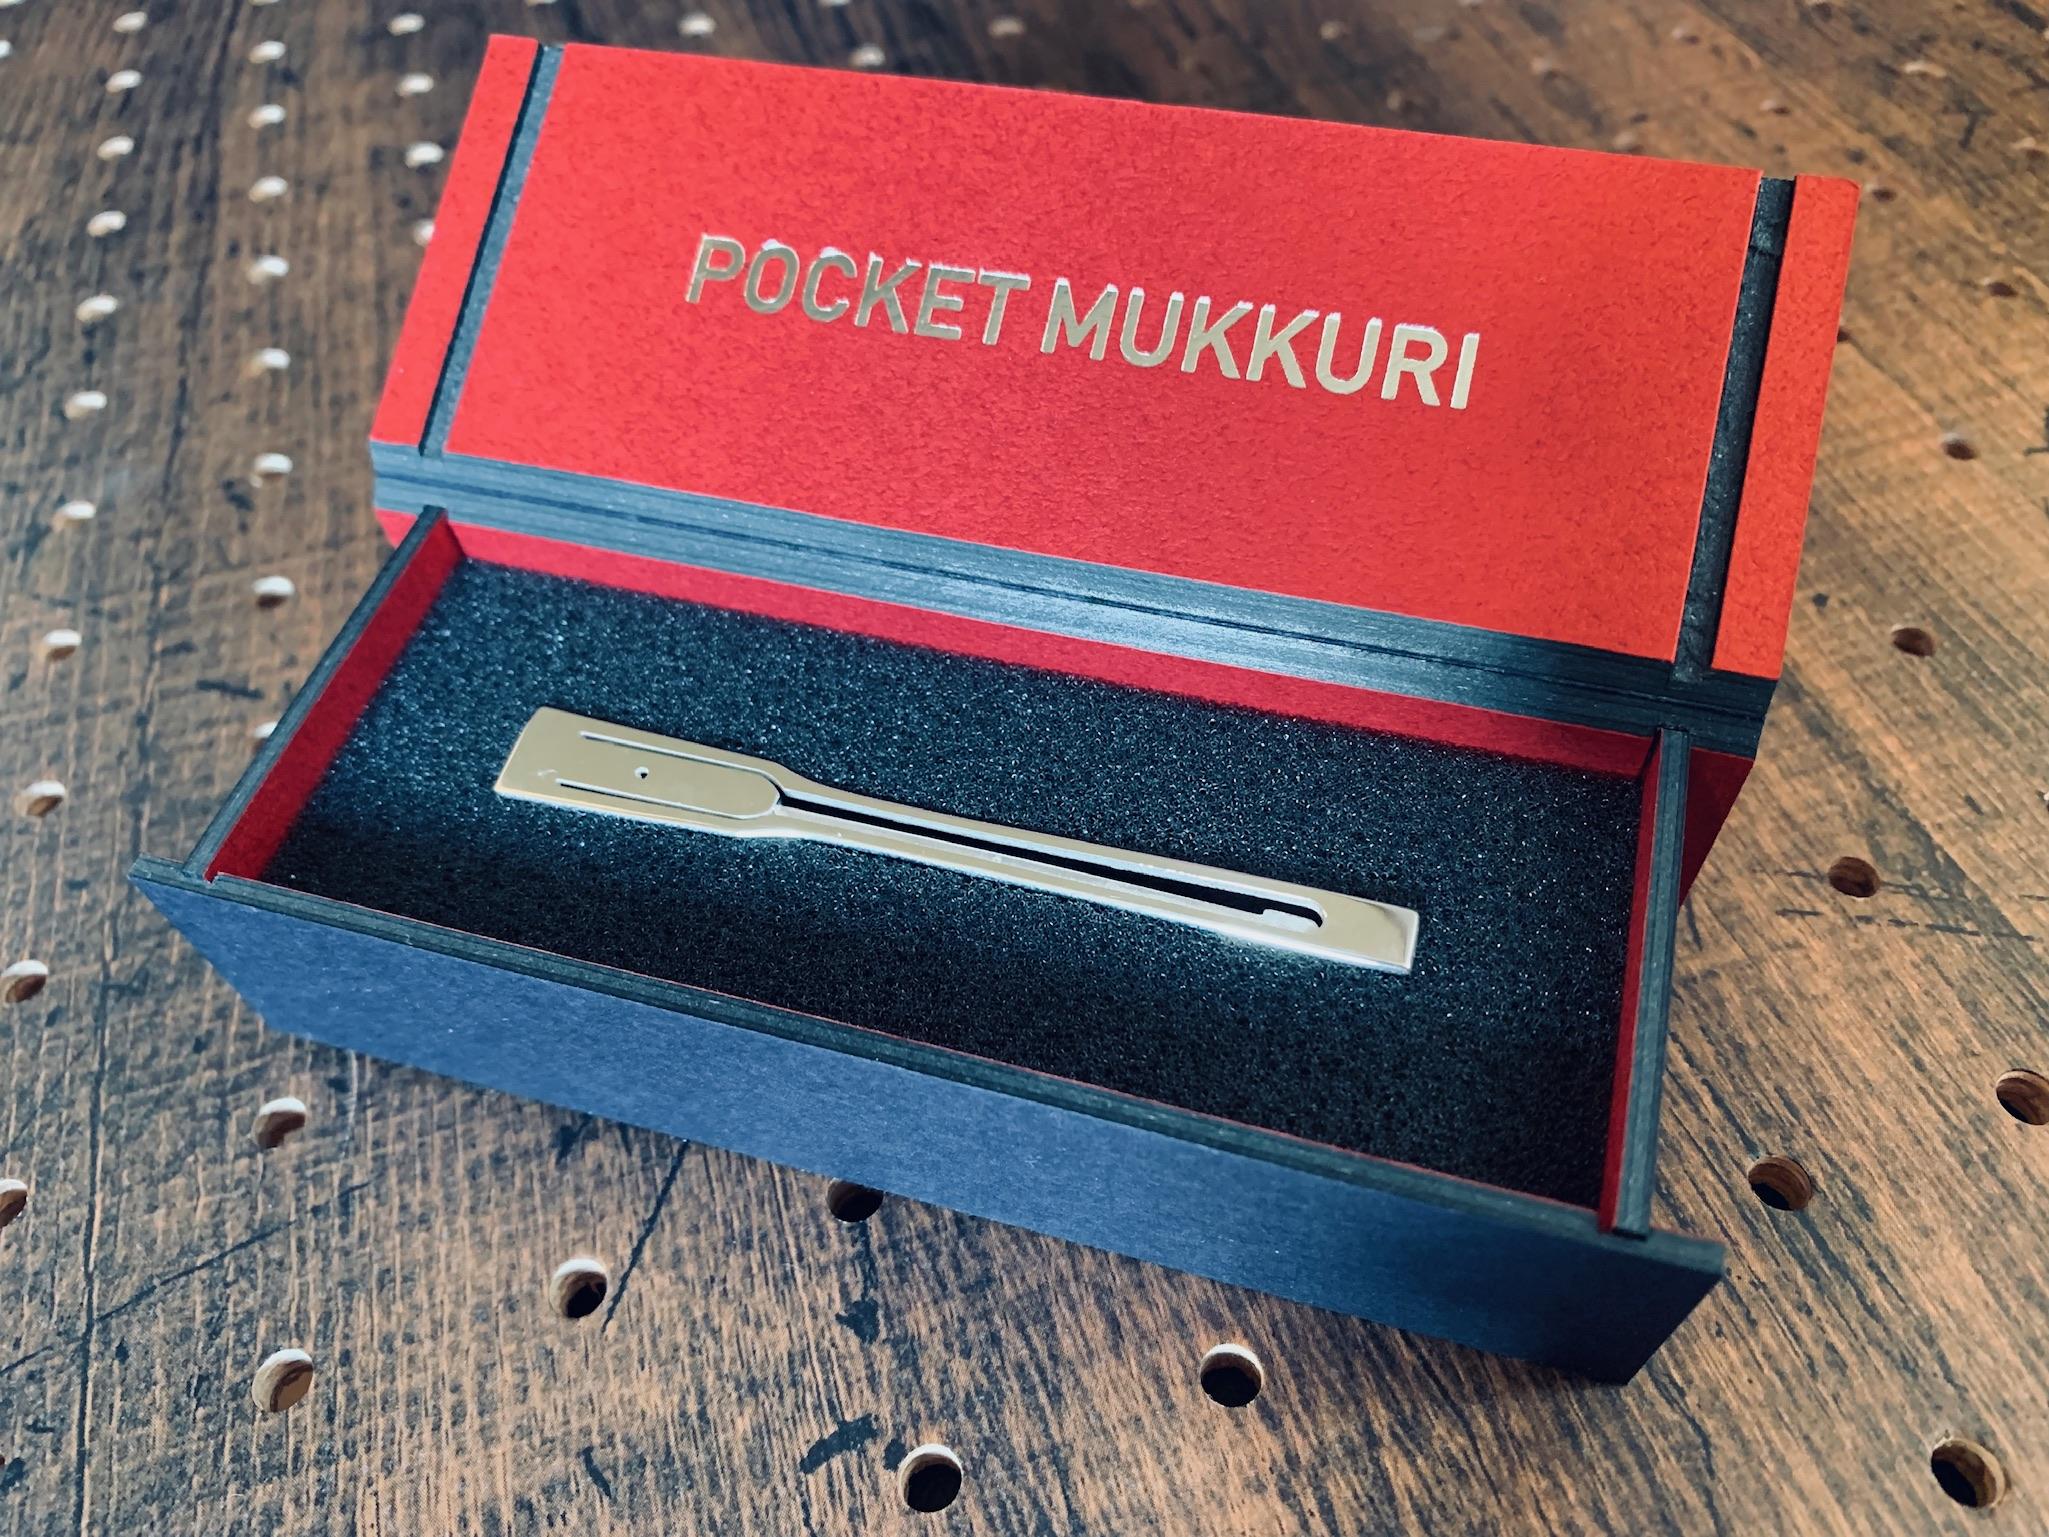 「【POCKET MUKKURI】発売」のアイキャッチ画像